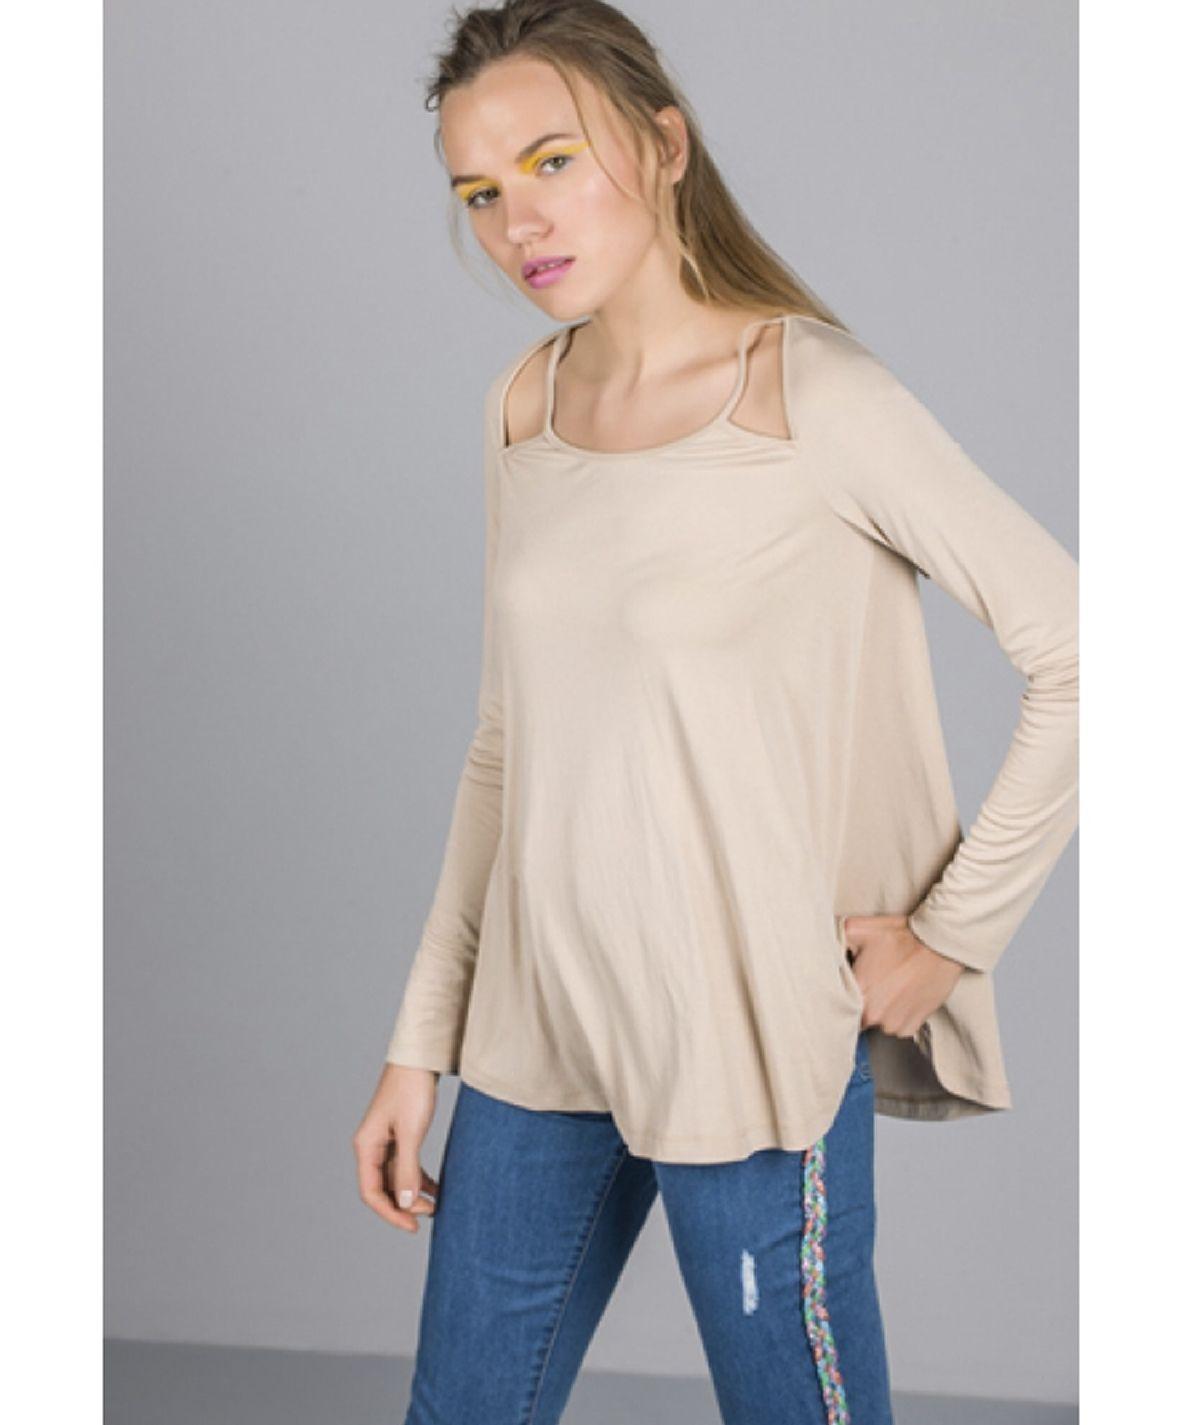 [CHIESSY] Blusa  decote...